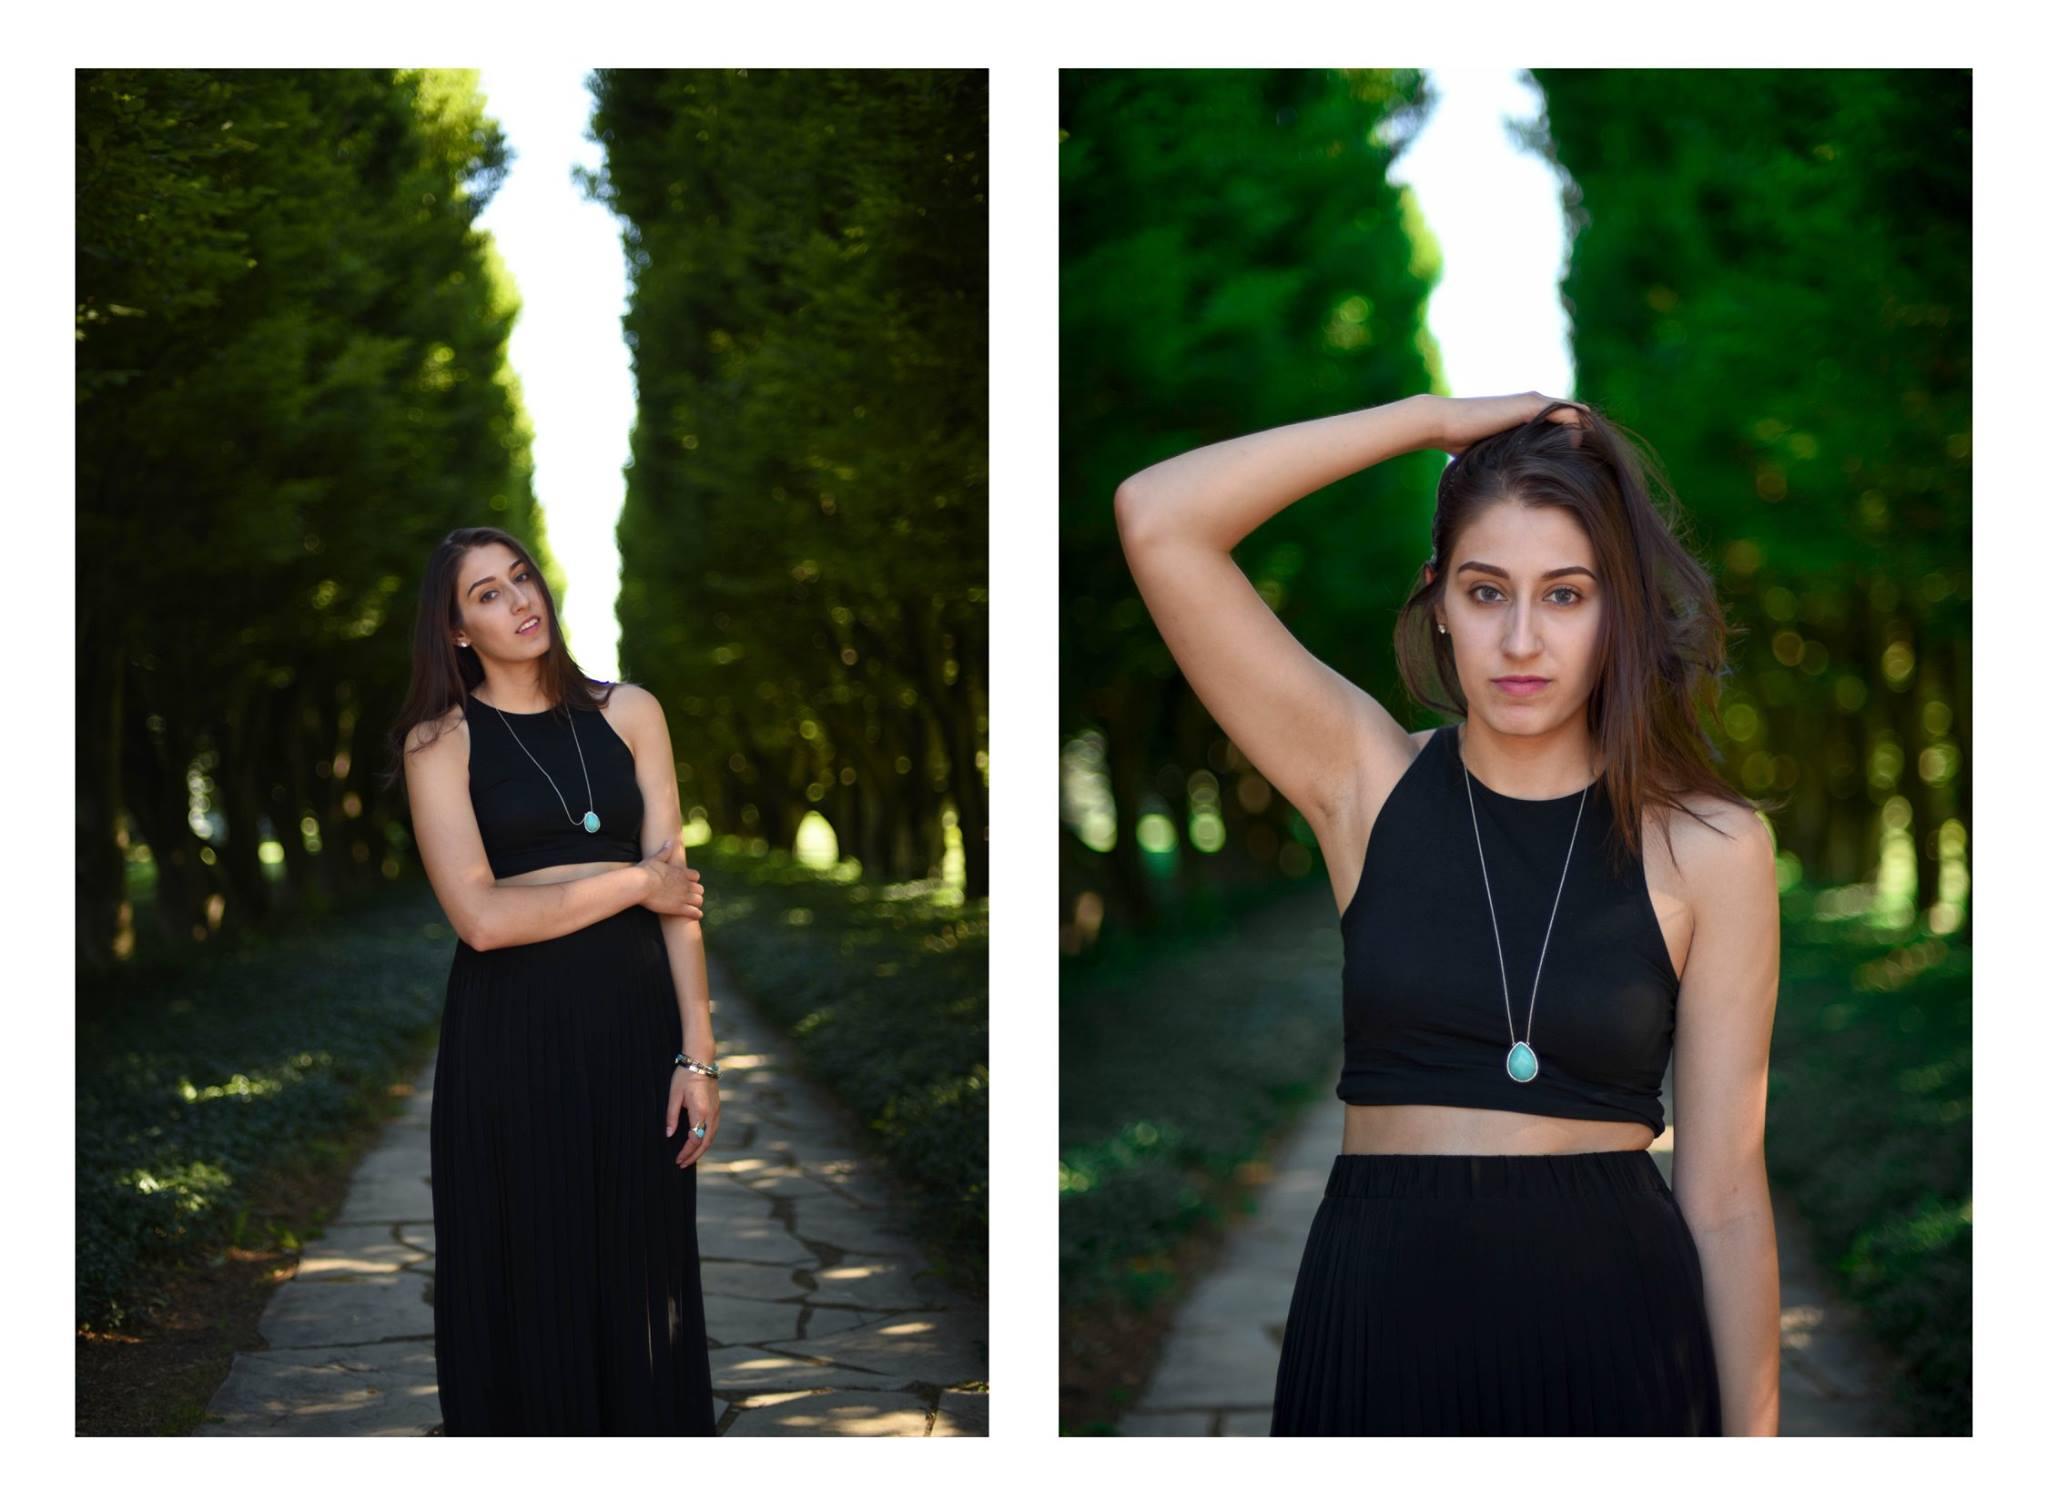 Photo-shoot for a modelling portfolio